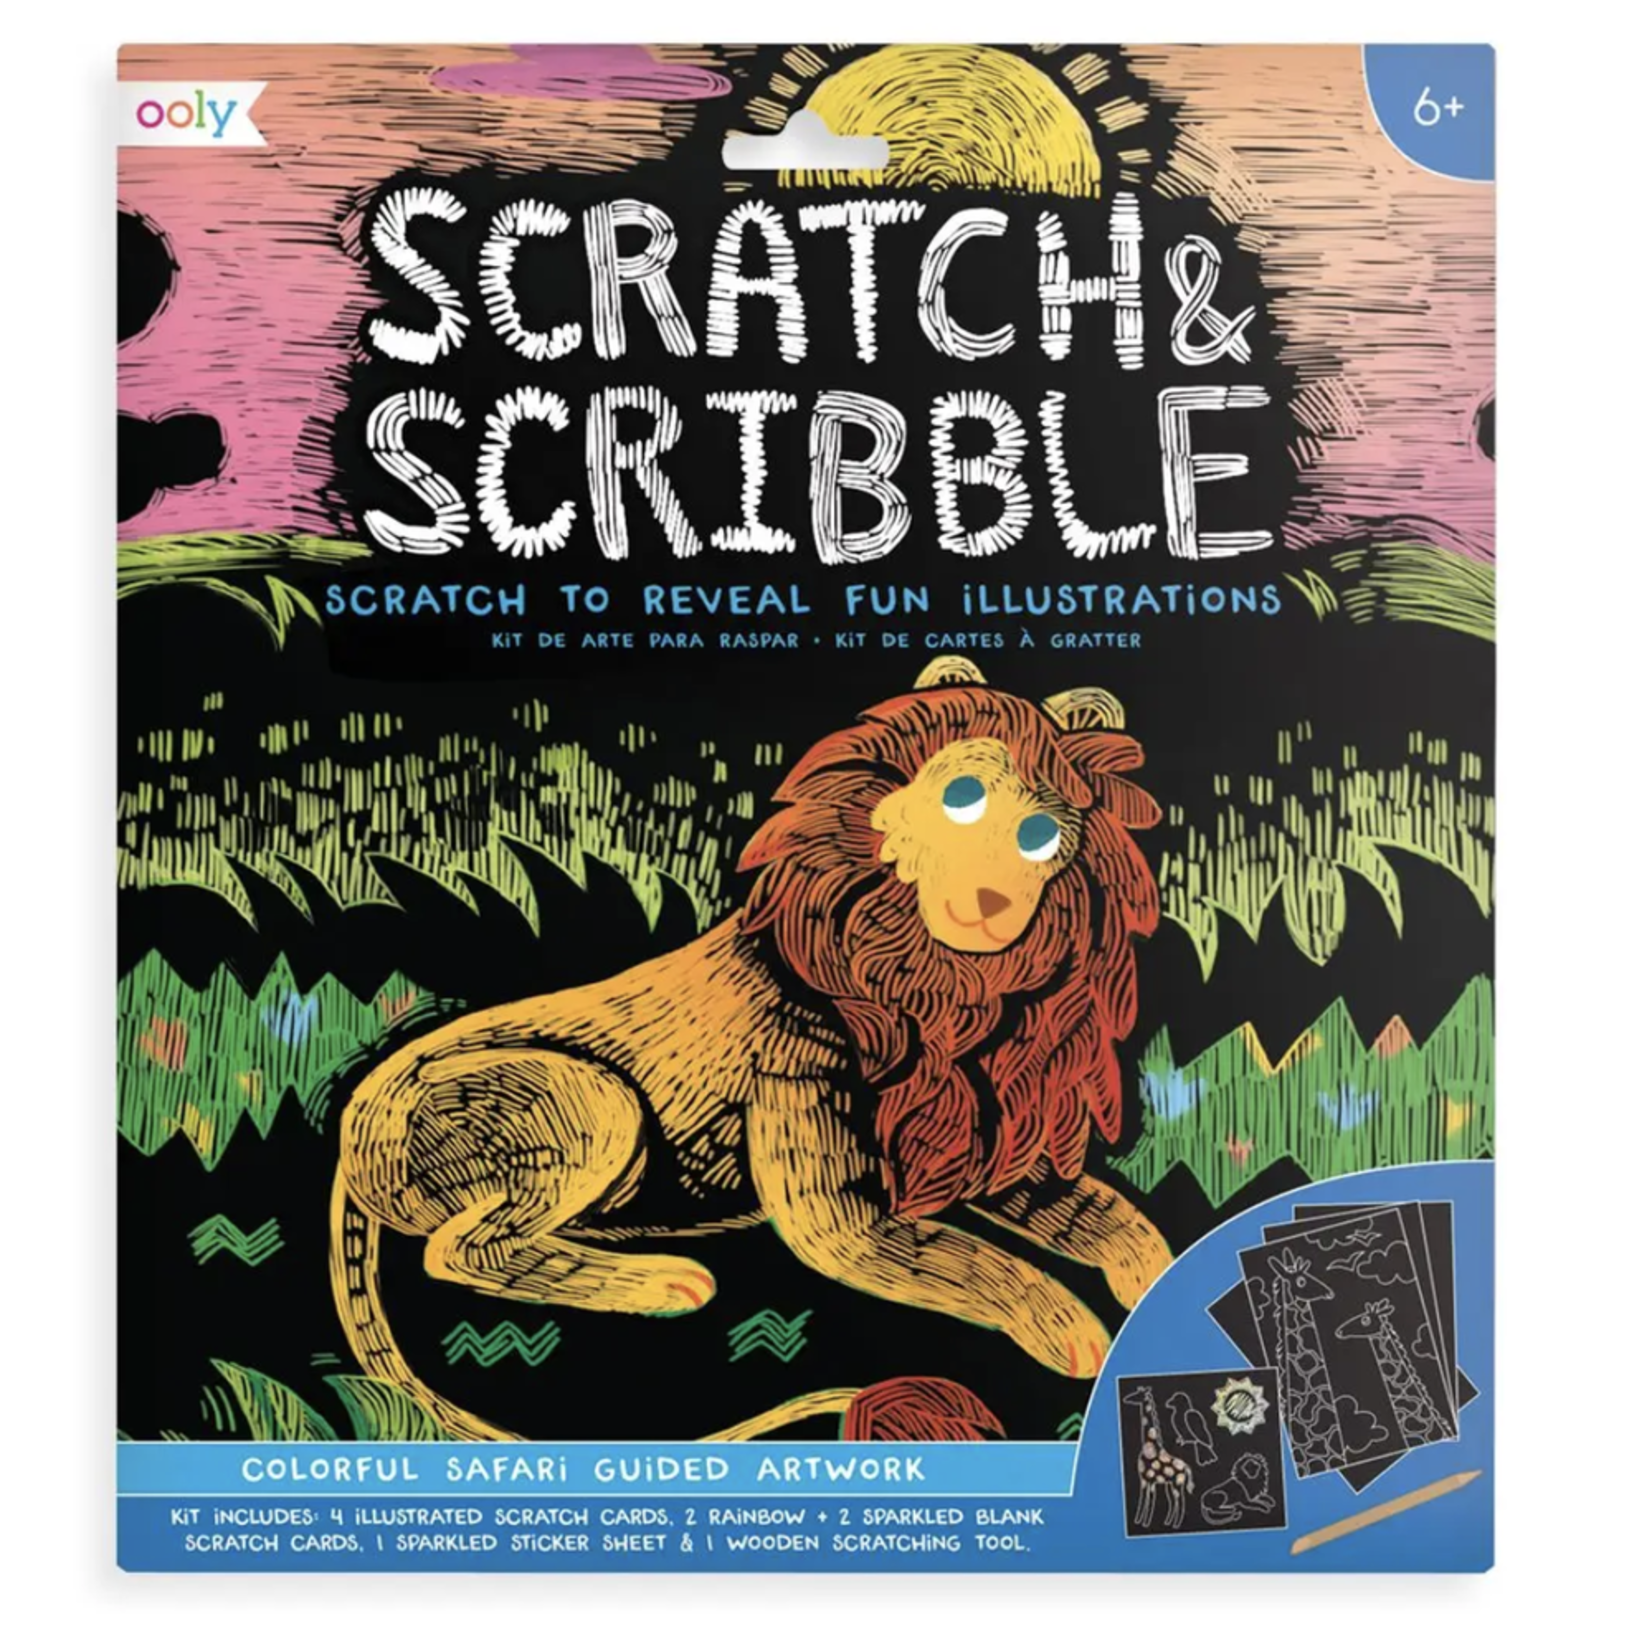 Scratch & Scribble Art Kit: Colorful Safari